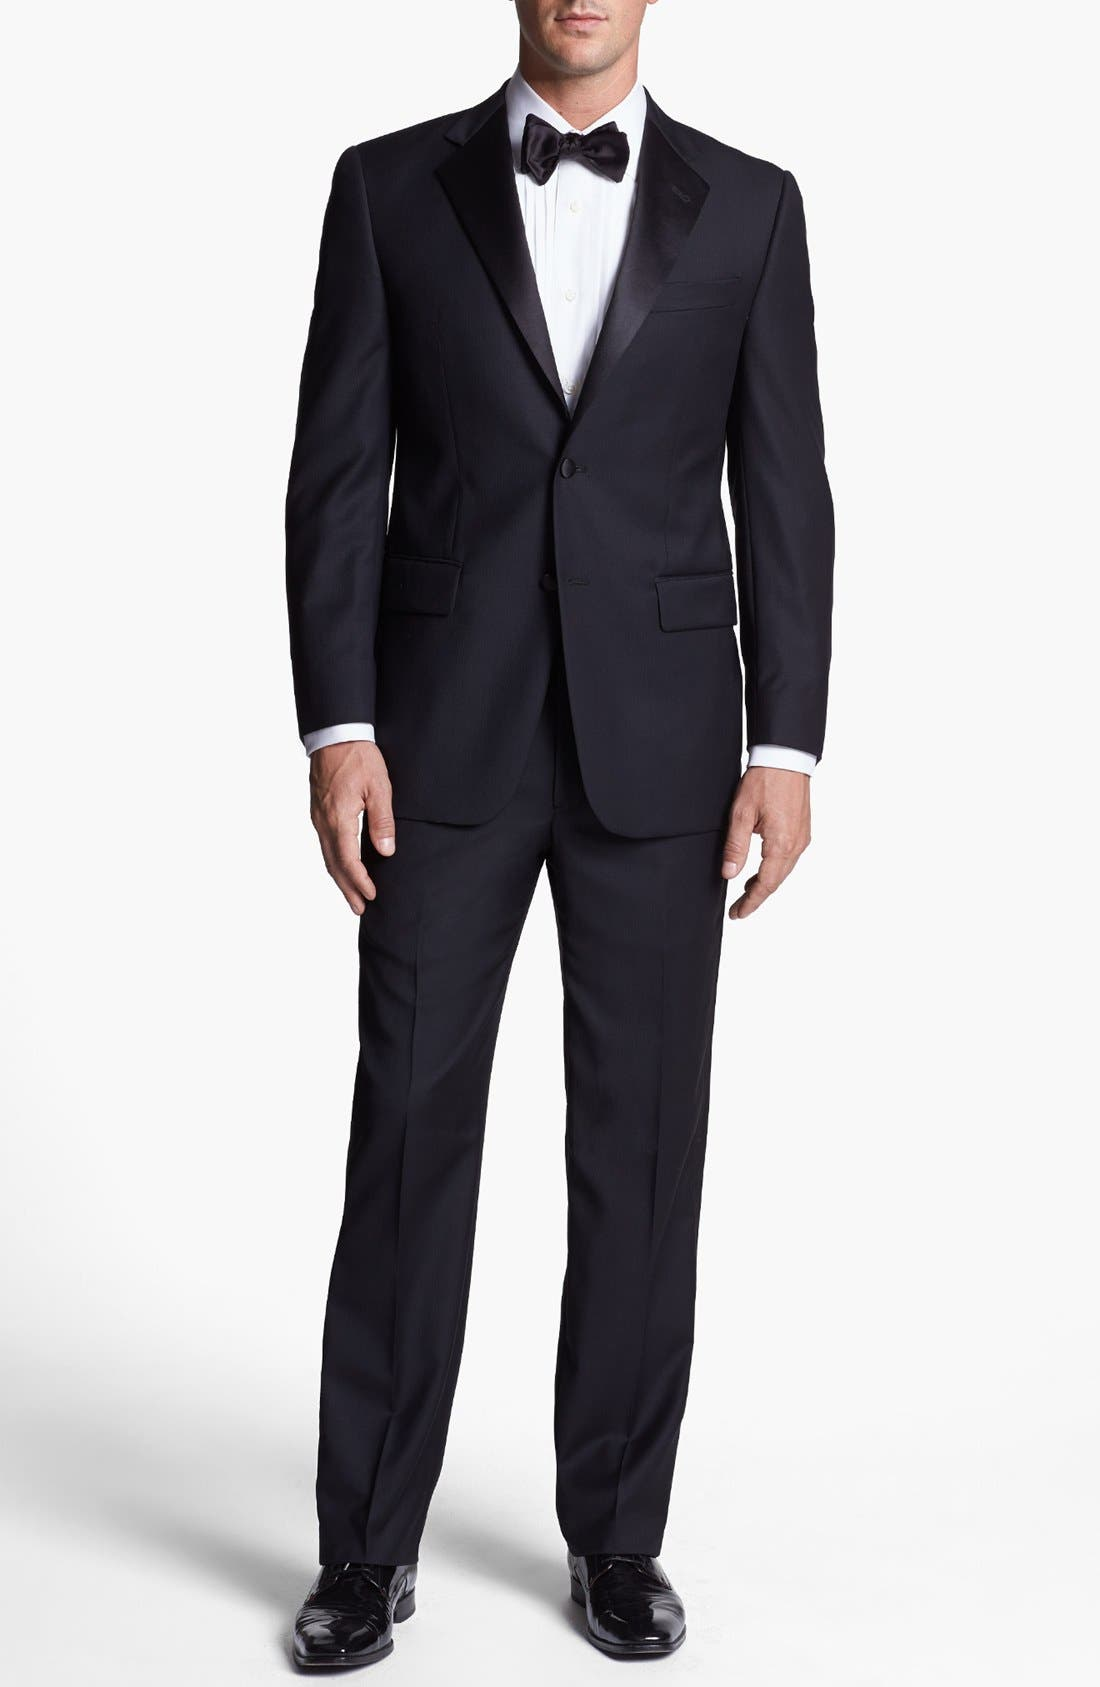 Main Image - Joseph Abboud Classic Fit Tuxedo